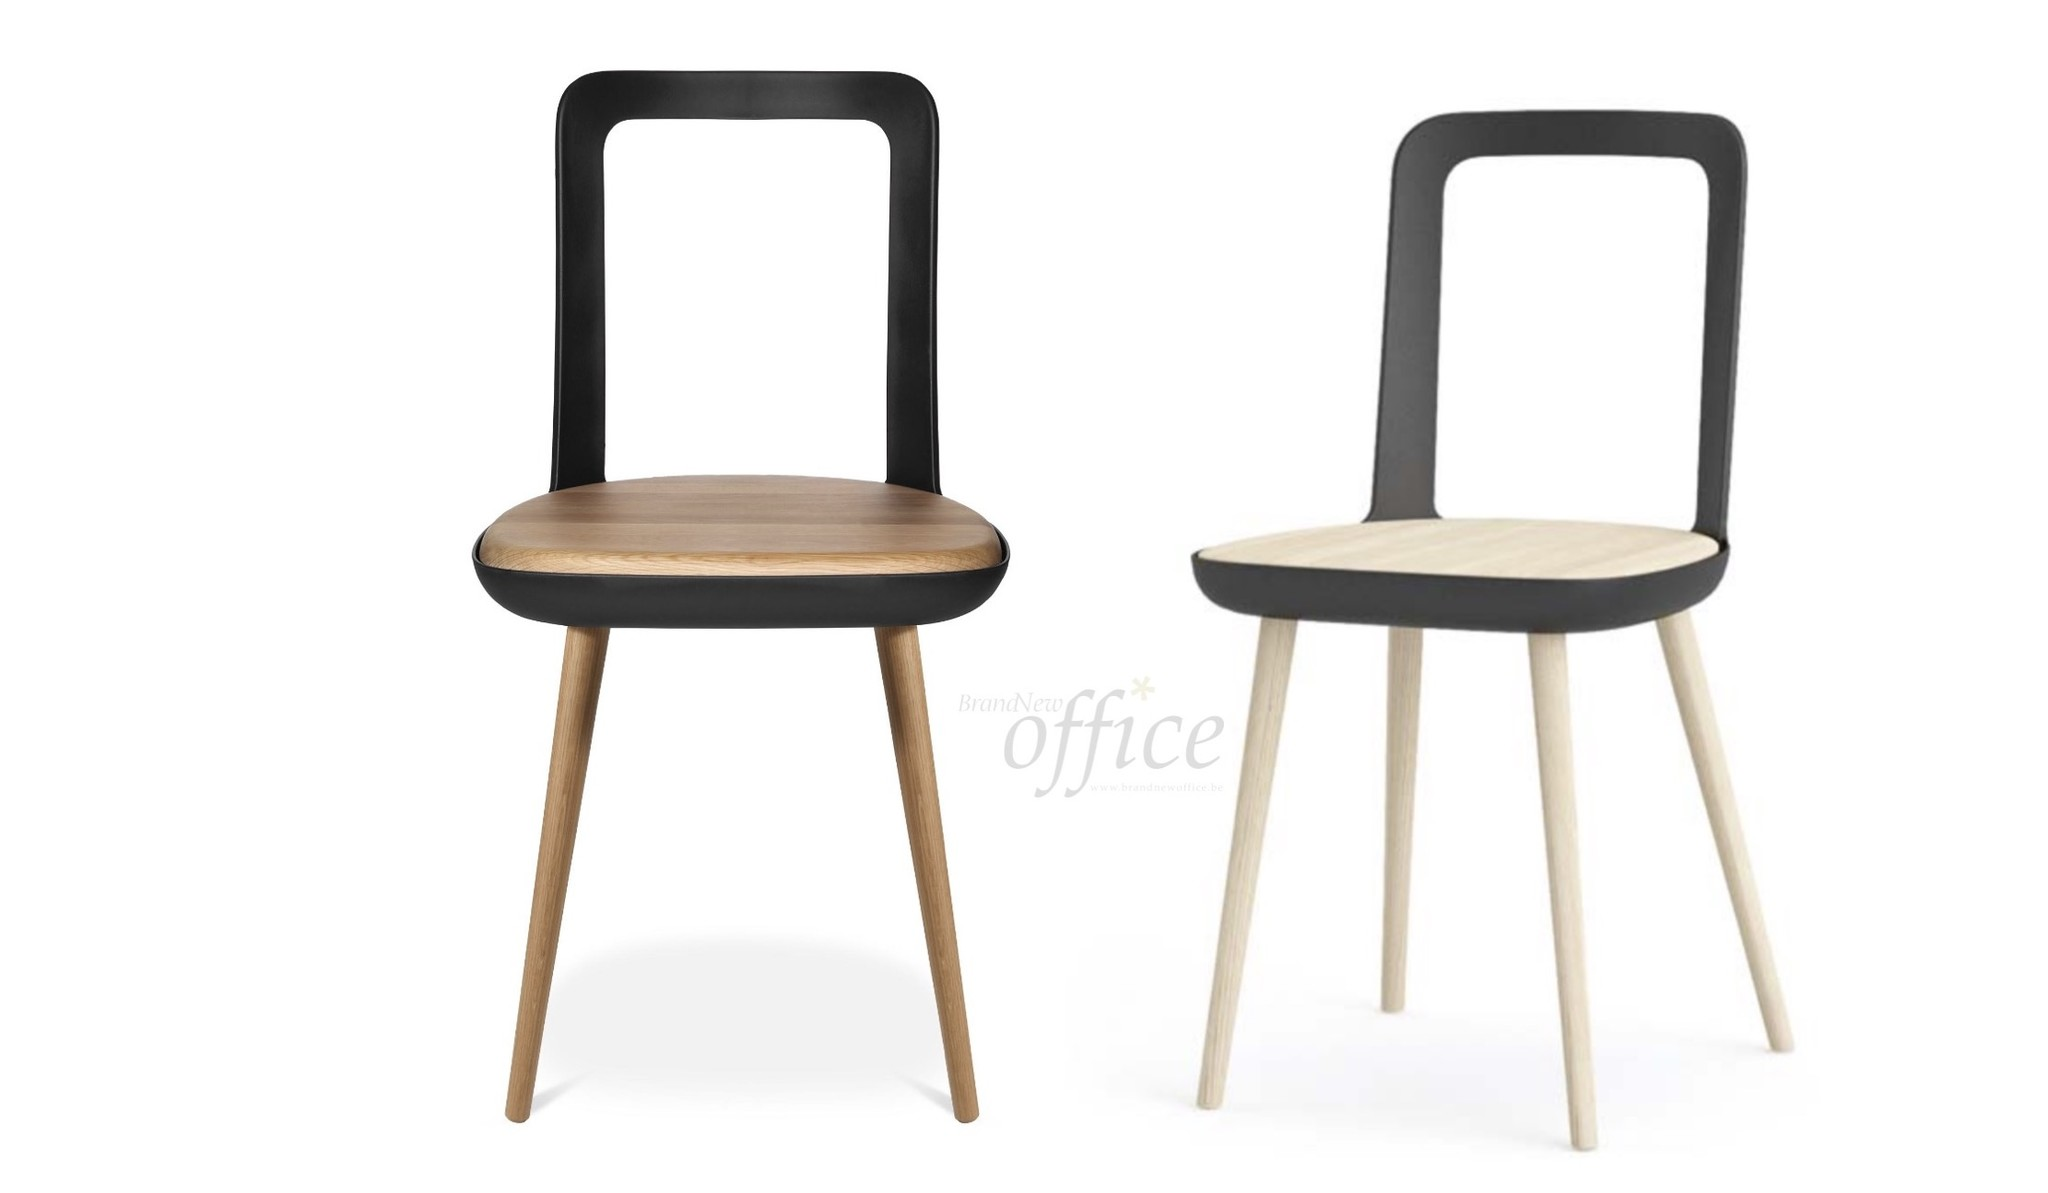 Houten Design Fauteuil.Wagner W 2020 Massief Houten Stoel Brand New Office